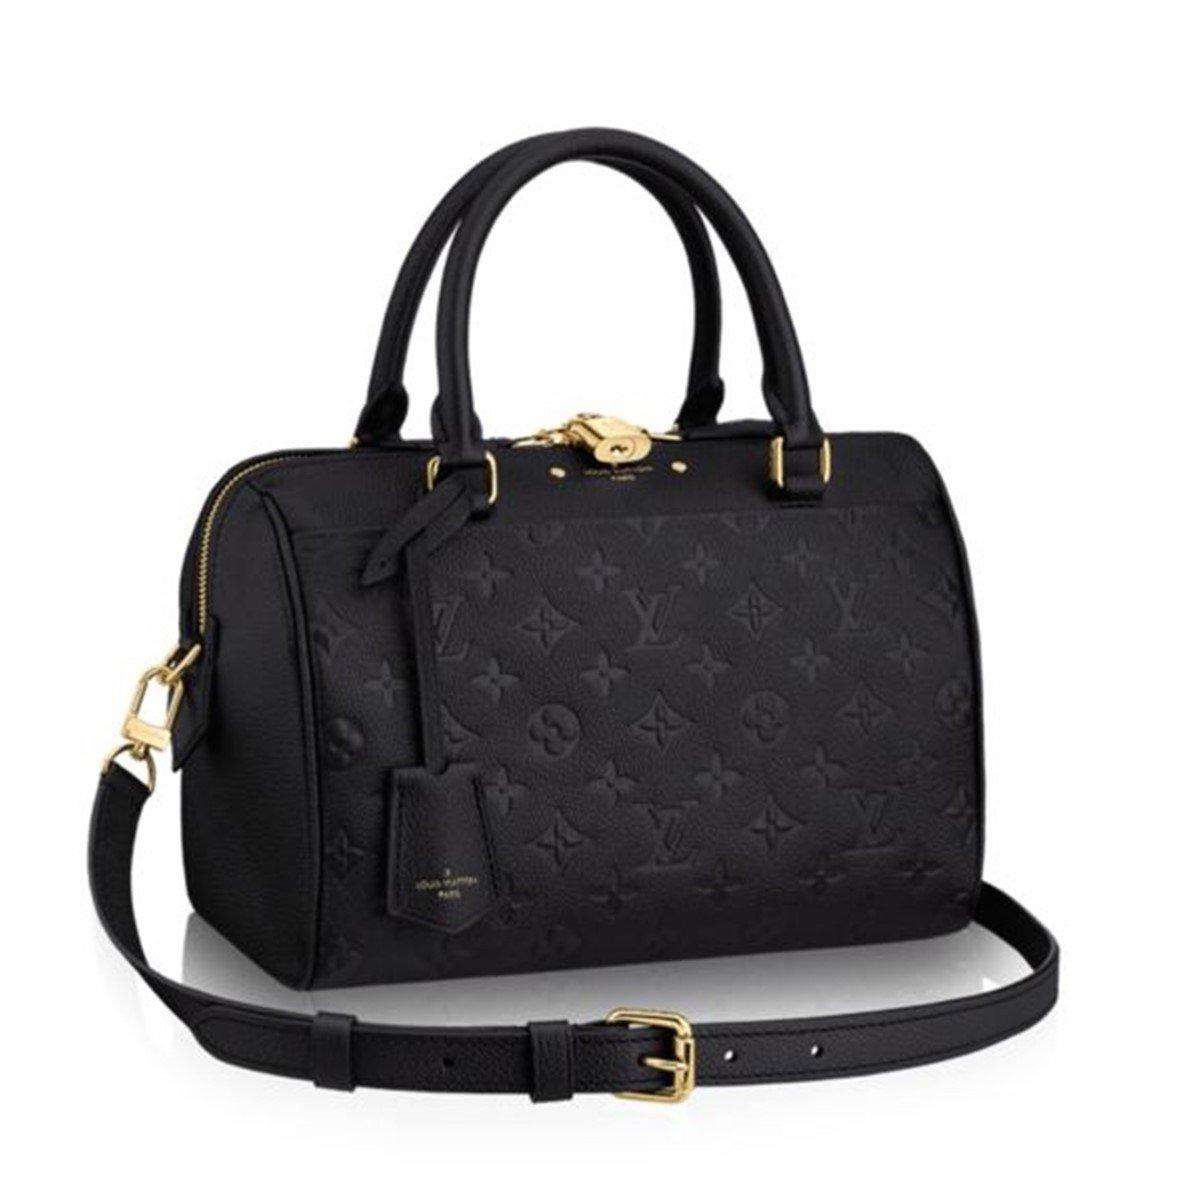 5634e86341b3 Louis Vuitton Monogram Canvas Cross Body Handbag Speedy Bandouliere 30  M42406 Made in France  Amazon.co.uk  Shoes   Bags